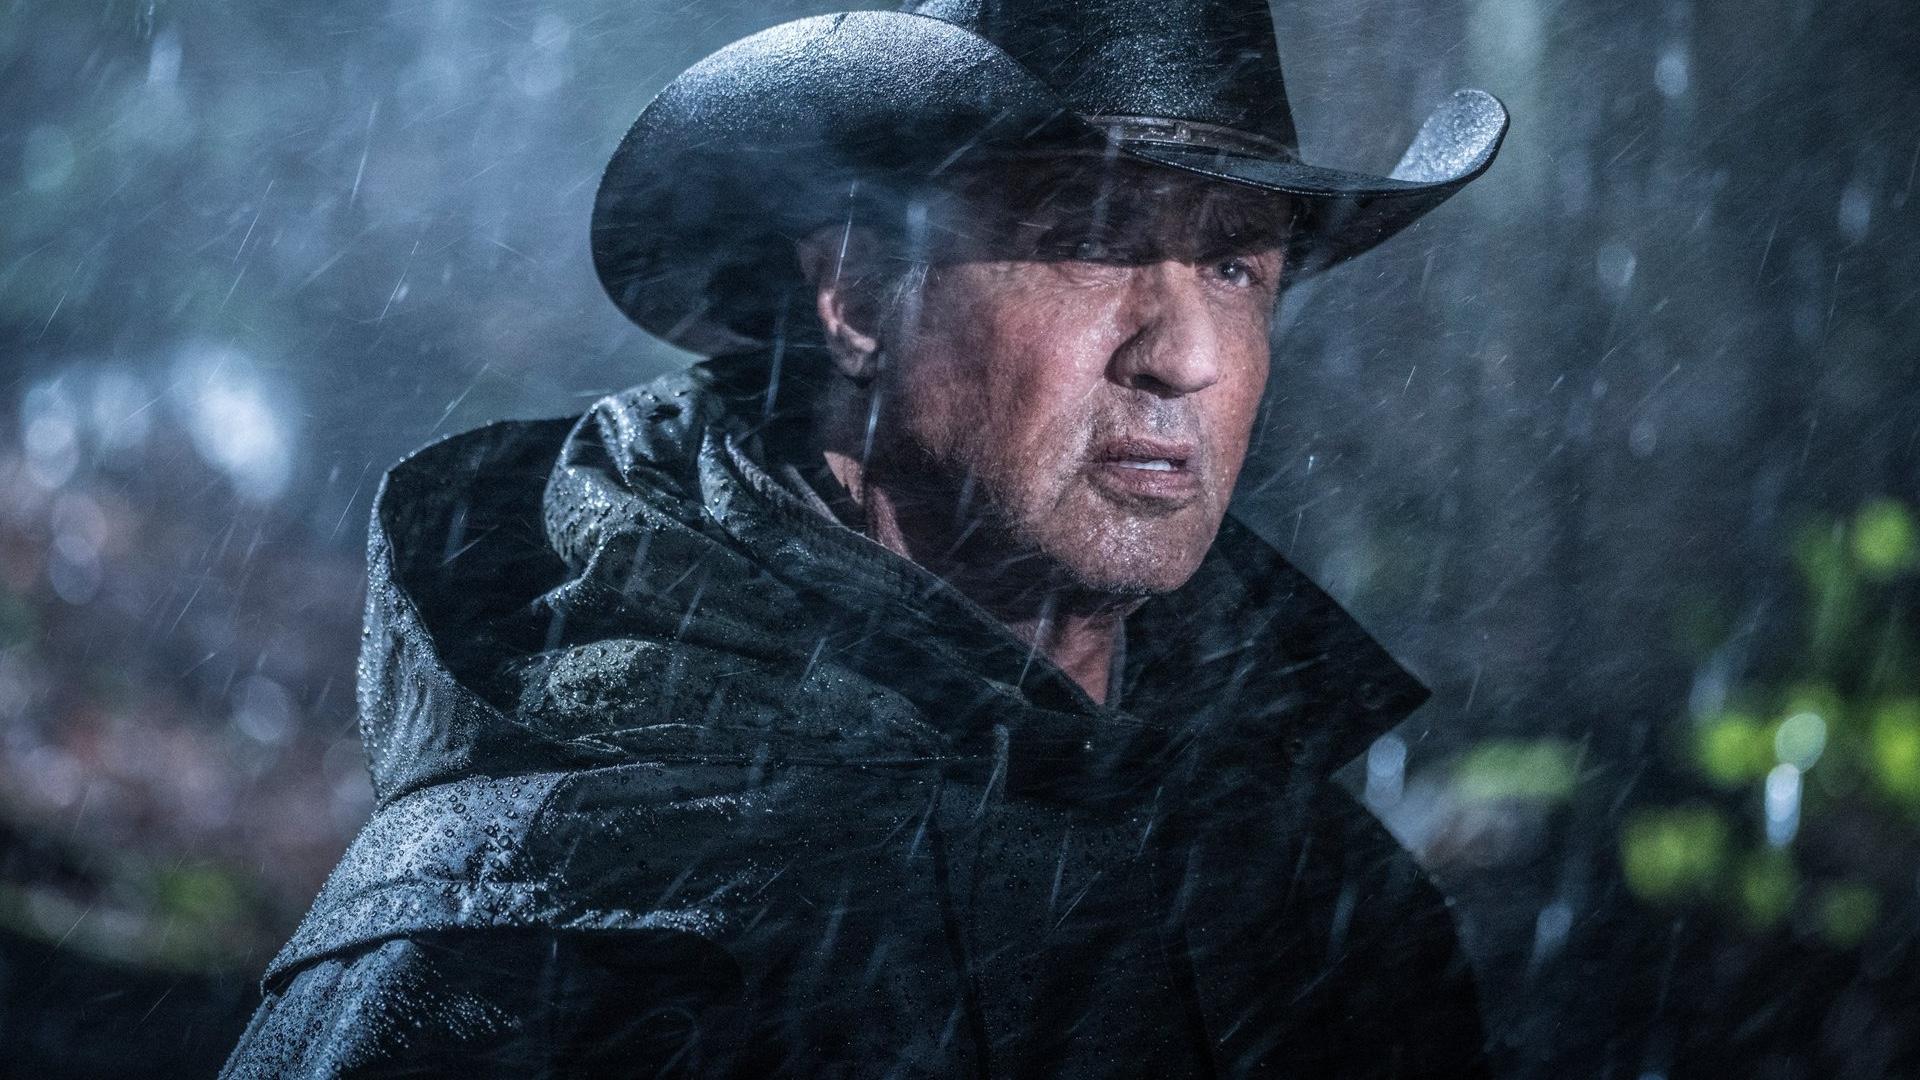 Rambo, Sylvester Stallone, 2019 Sequel, Cowboy Hat